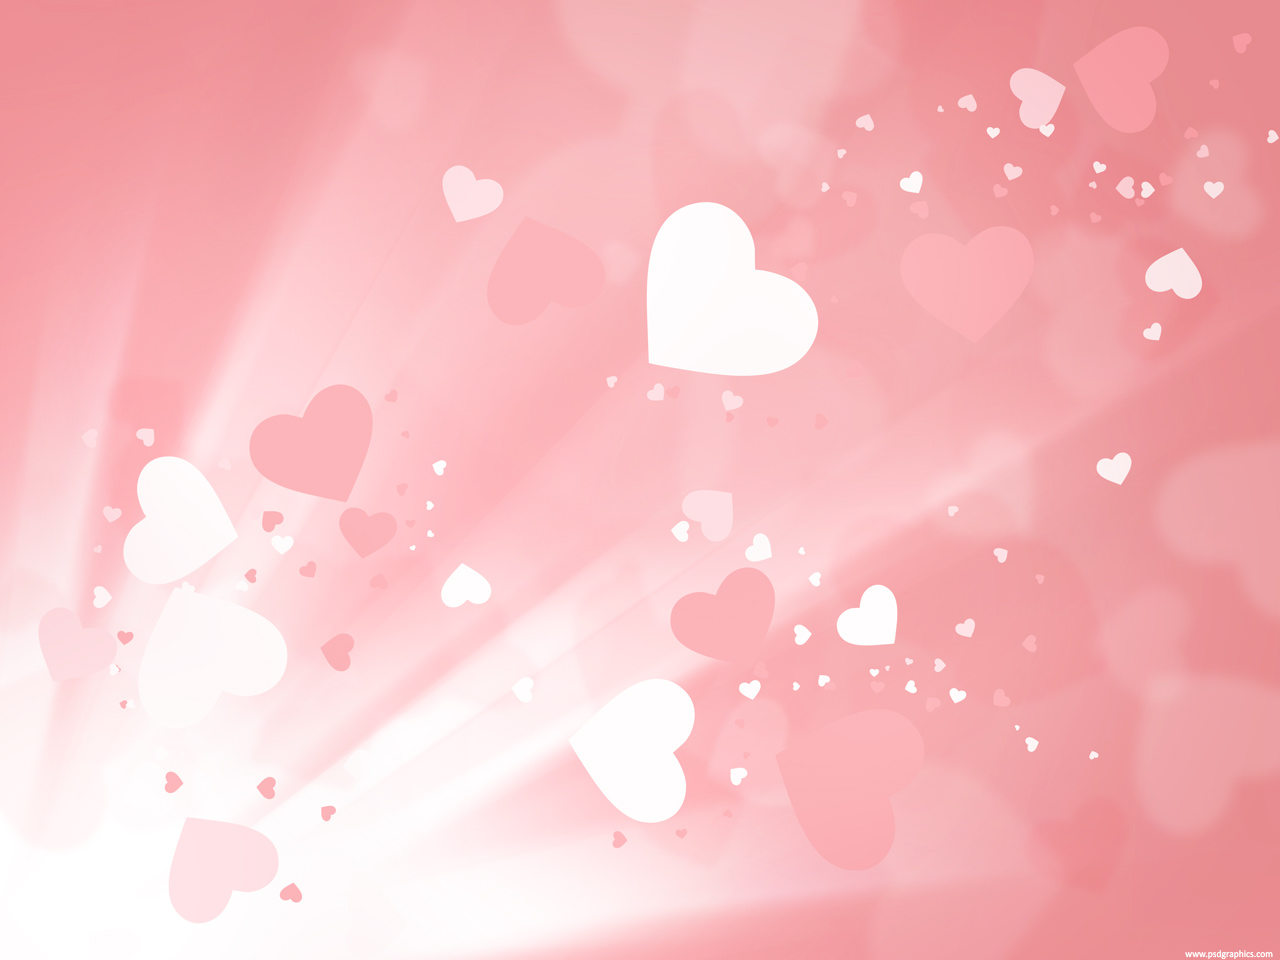 Valentines Day Background 2015 Wallpaper 12406 Wallpaper 1280x960